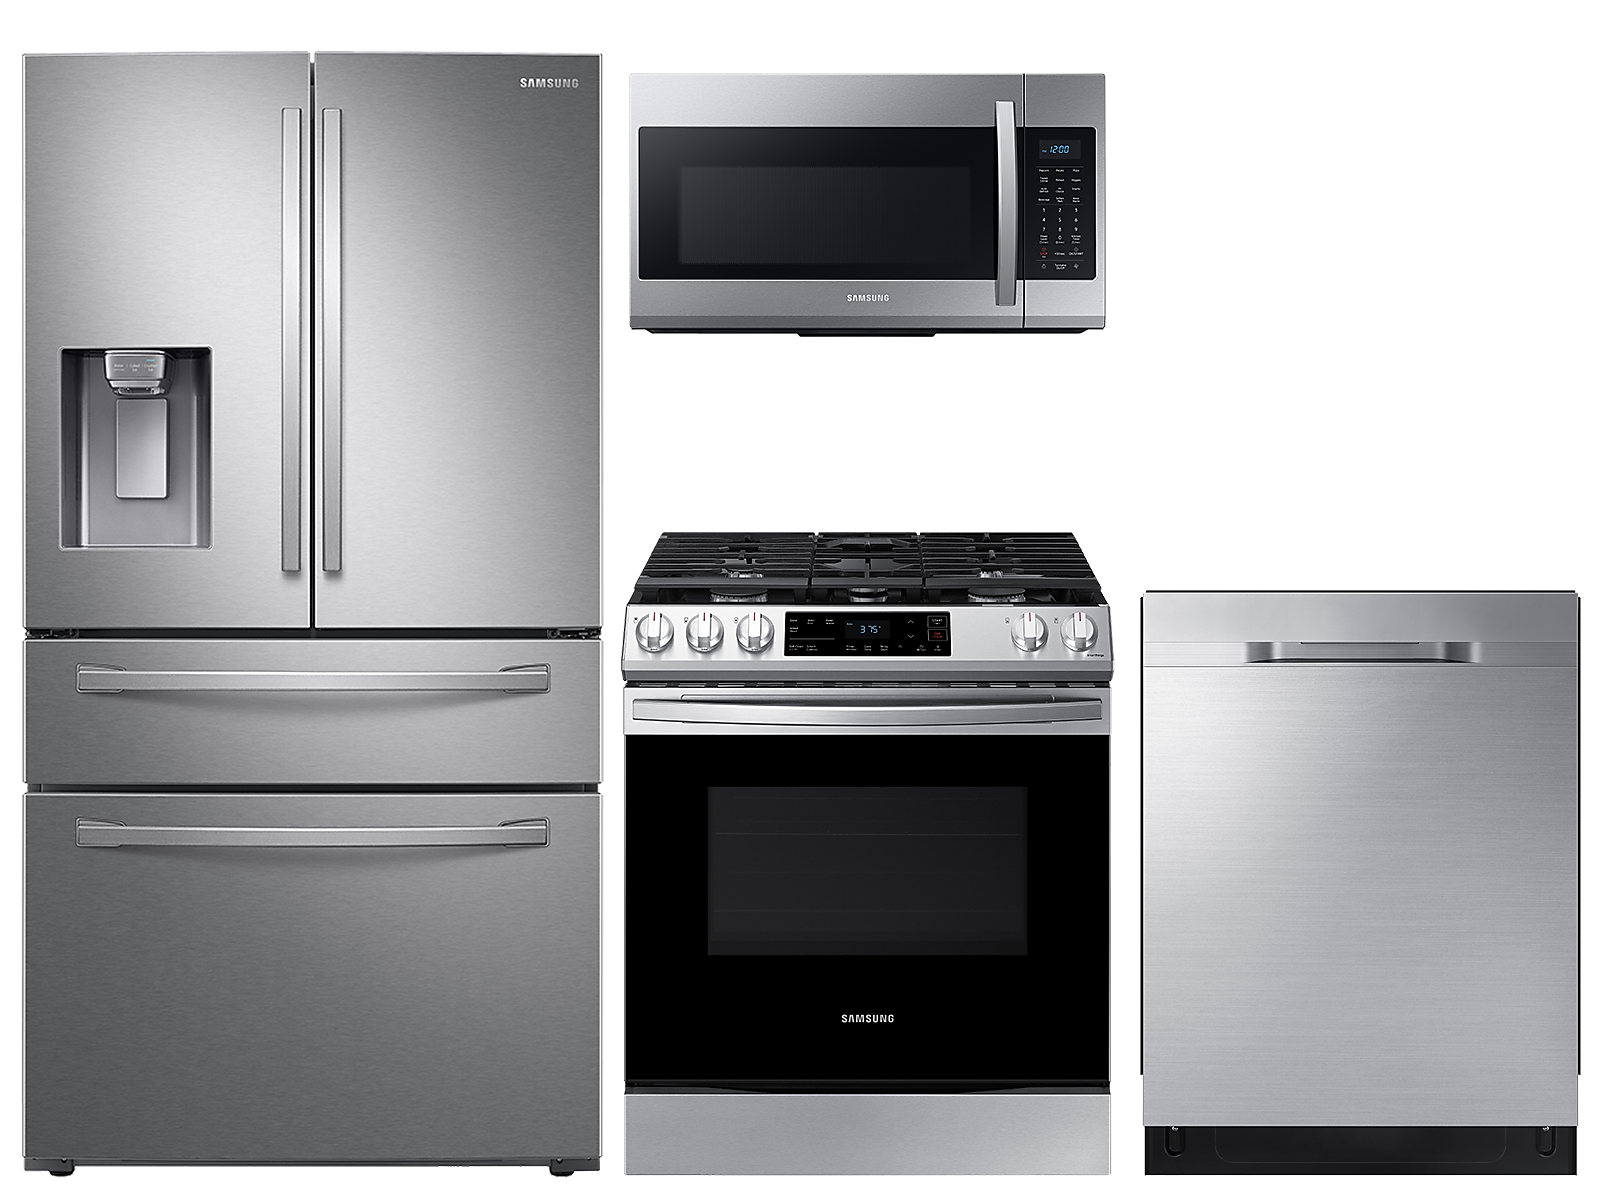 Samsung coupon: Samsung 28 cu. ft. 4-door refrigerator, gas range, microwave and dishwasher package(BNDL-1612902654943)